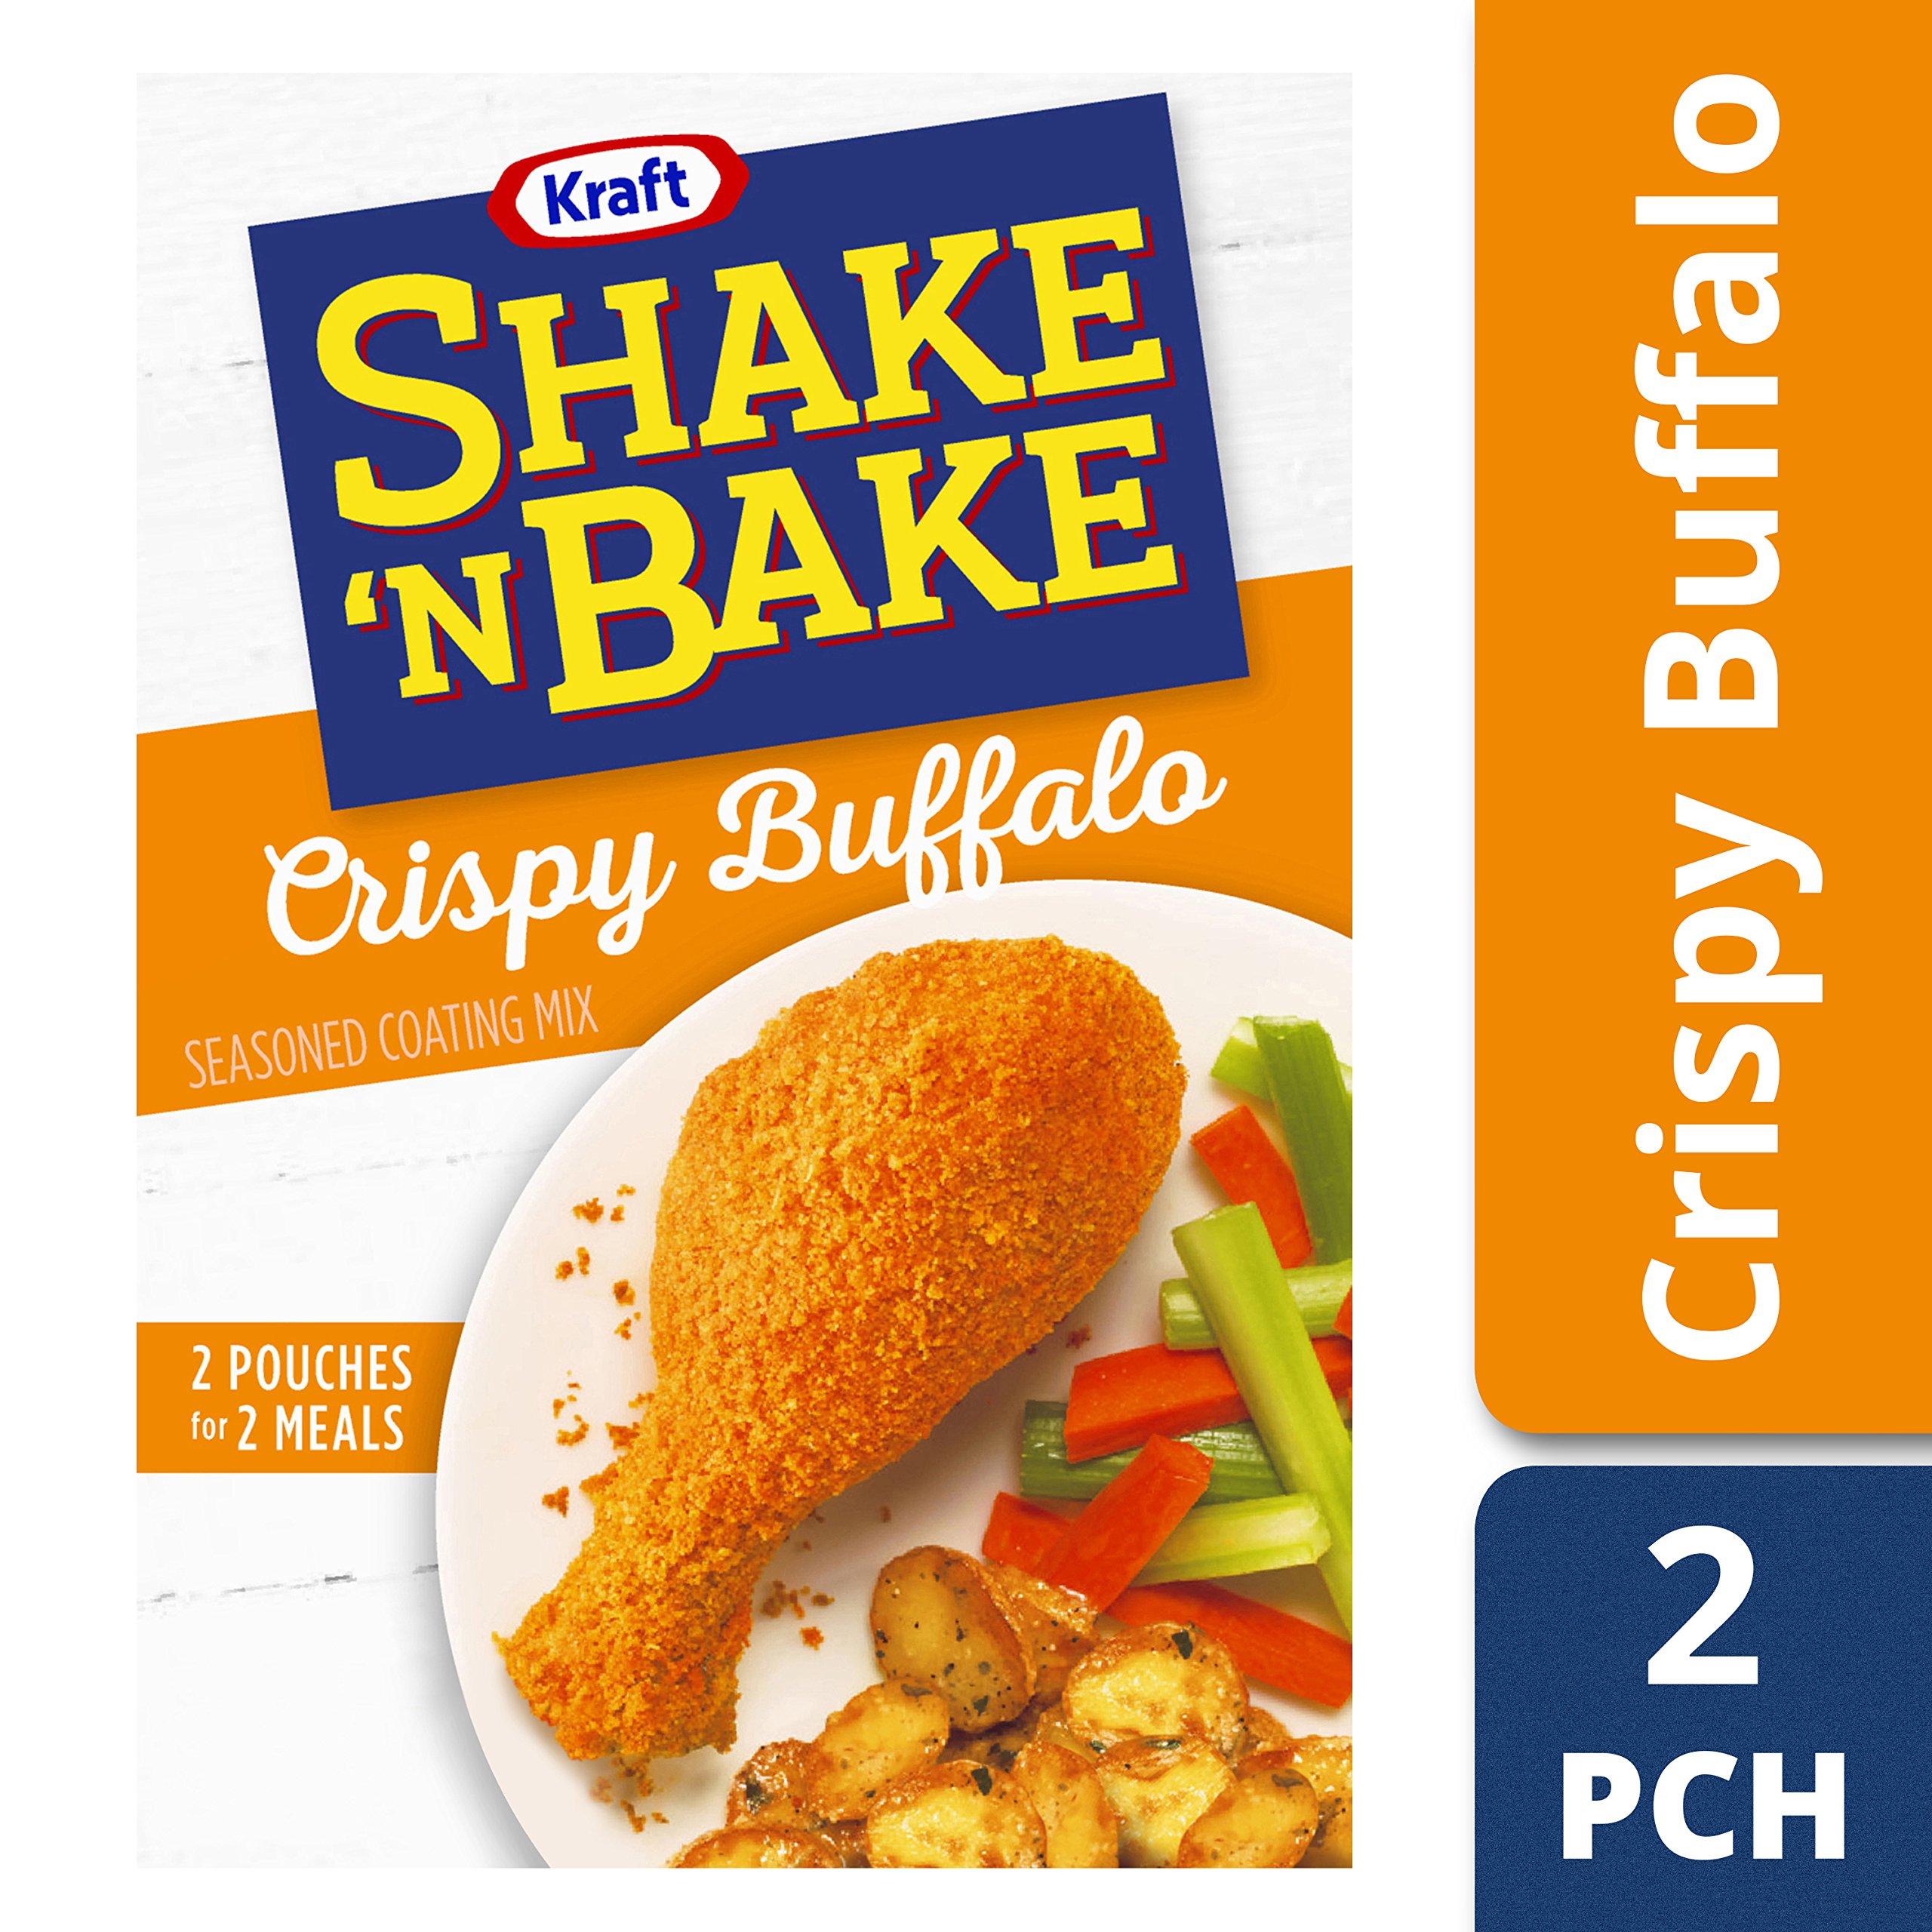 Kraft Shake N Bake Seasoned Coating Mix Box, Crispy Buffalo, 4.75 Ounce (Pack of 8)